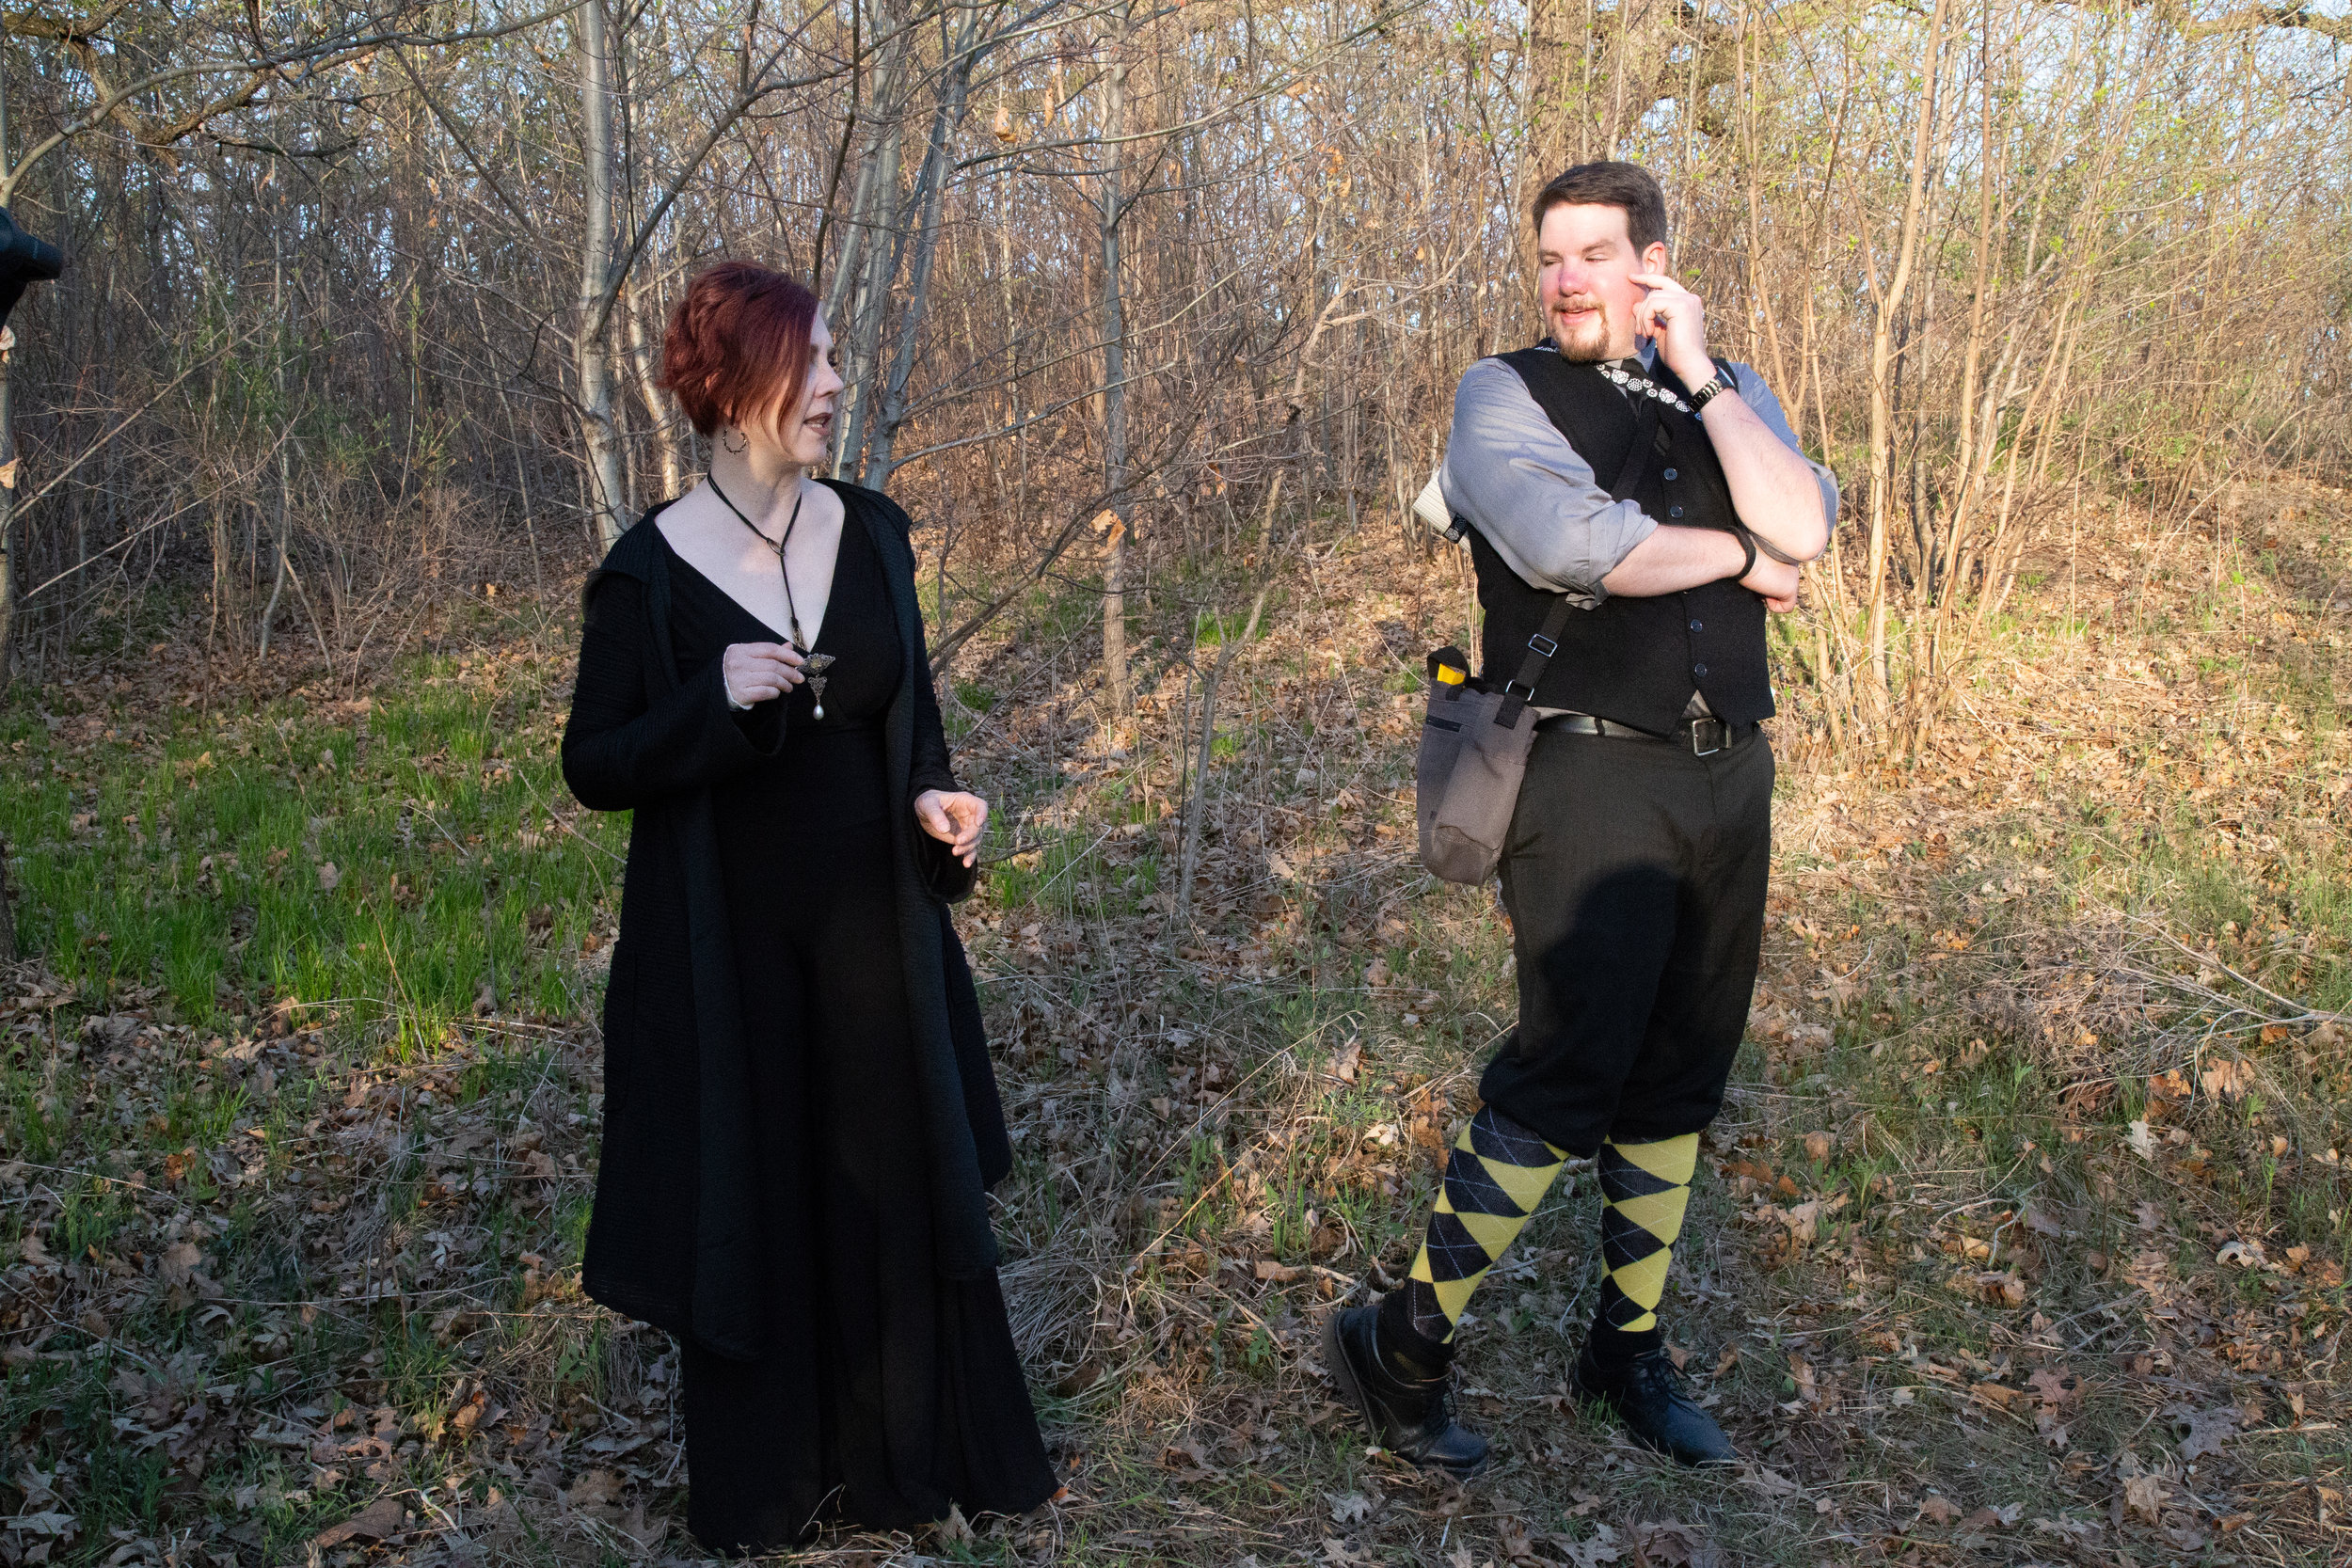 Olivia (Kelli Tatum) shocked by the behavior and fashion choices of Malvolio (Tom Sorenson)